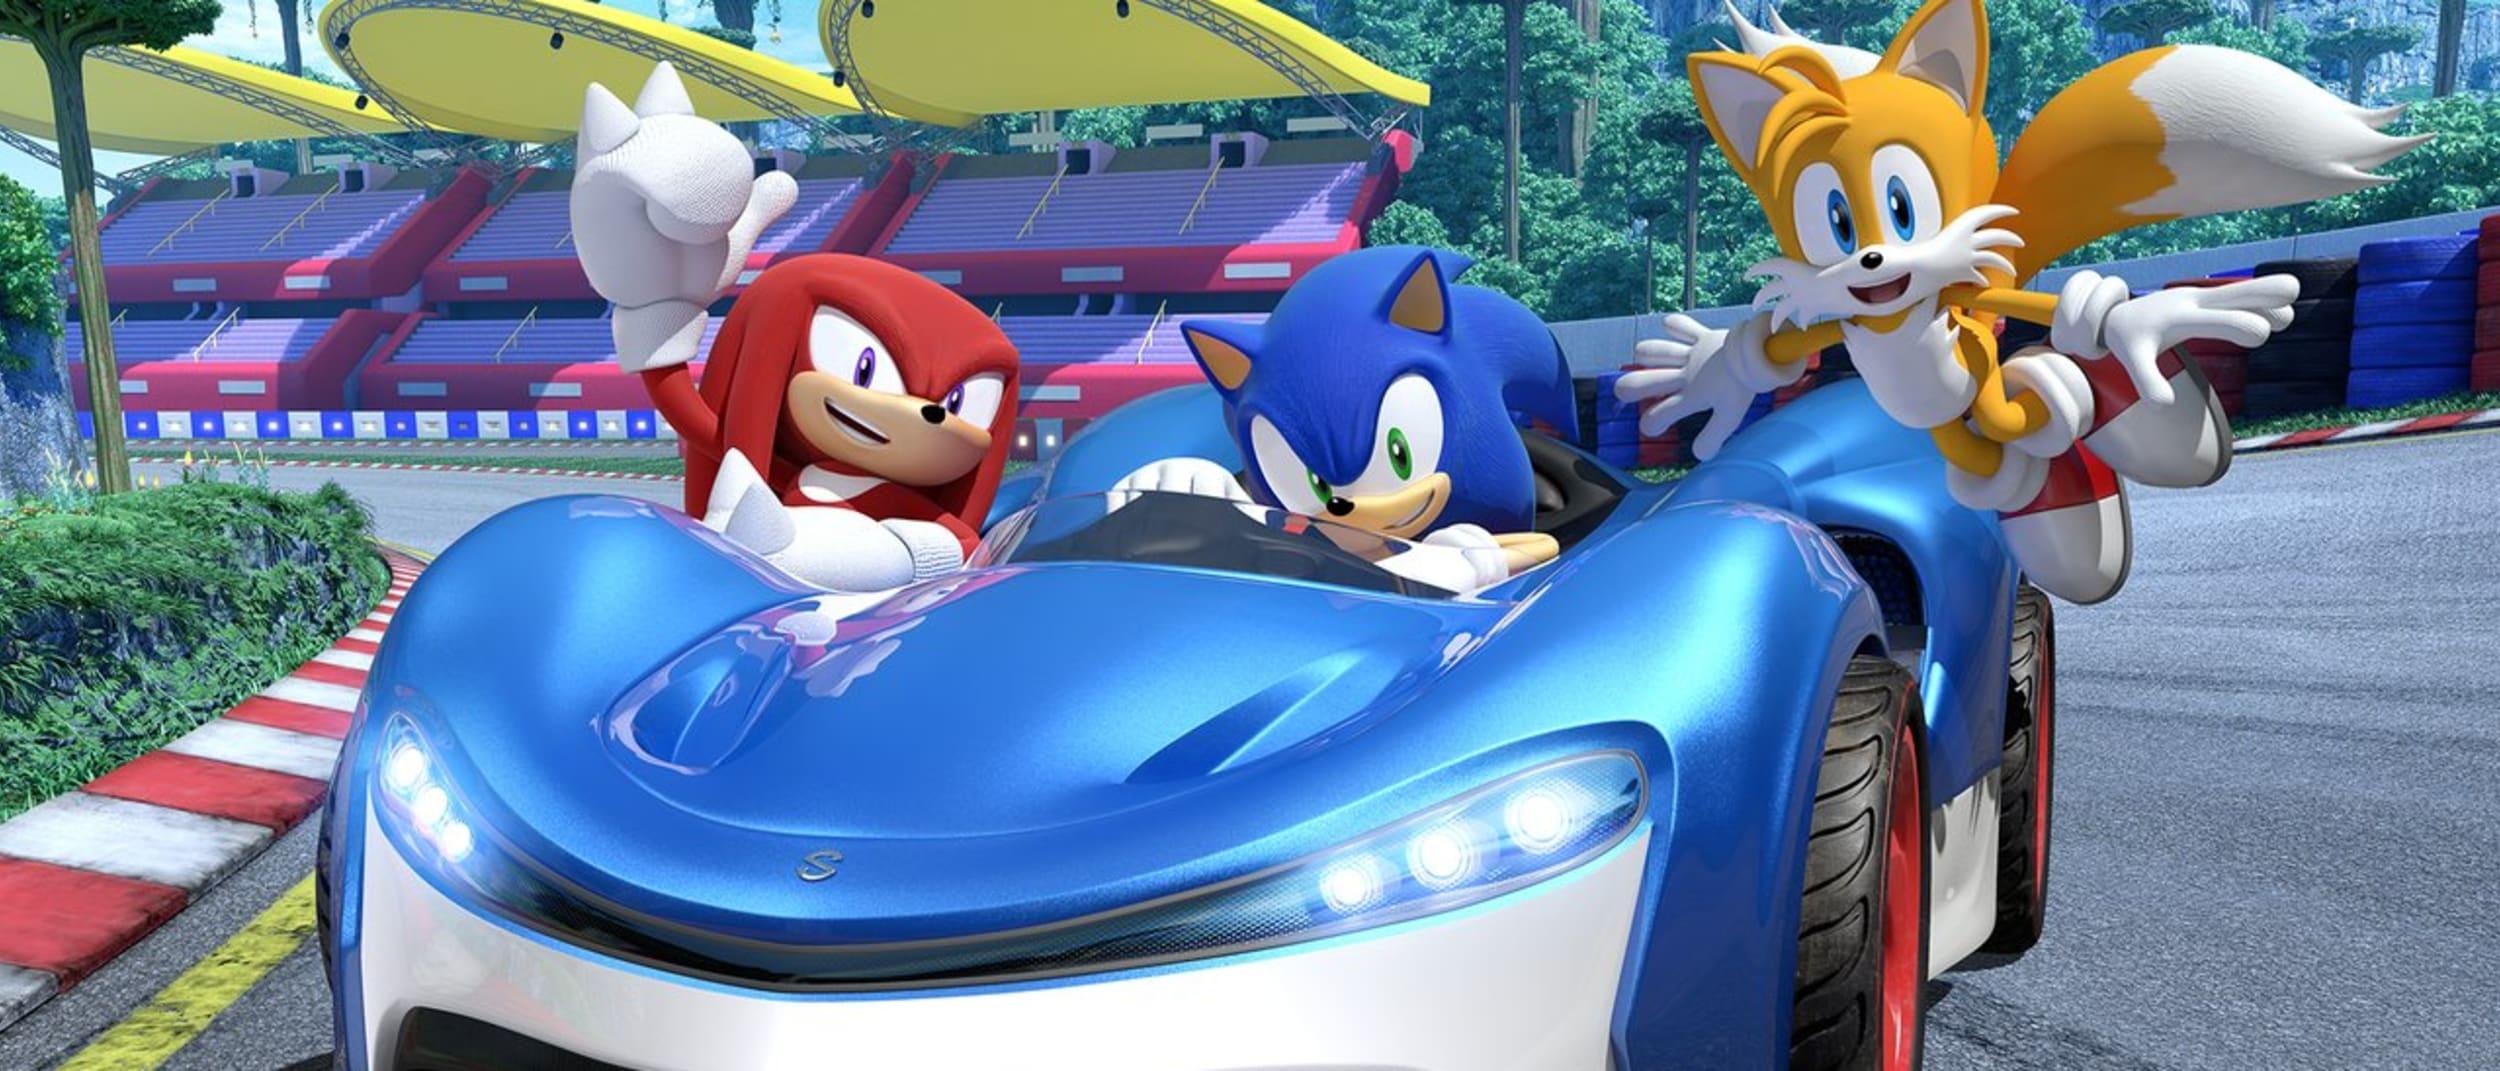 Team Sonic interactive games arena